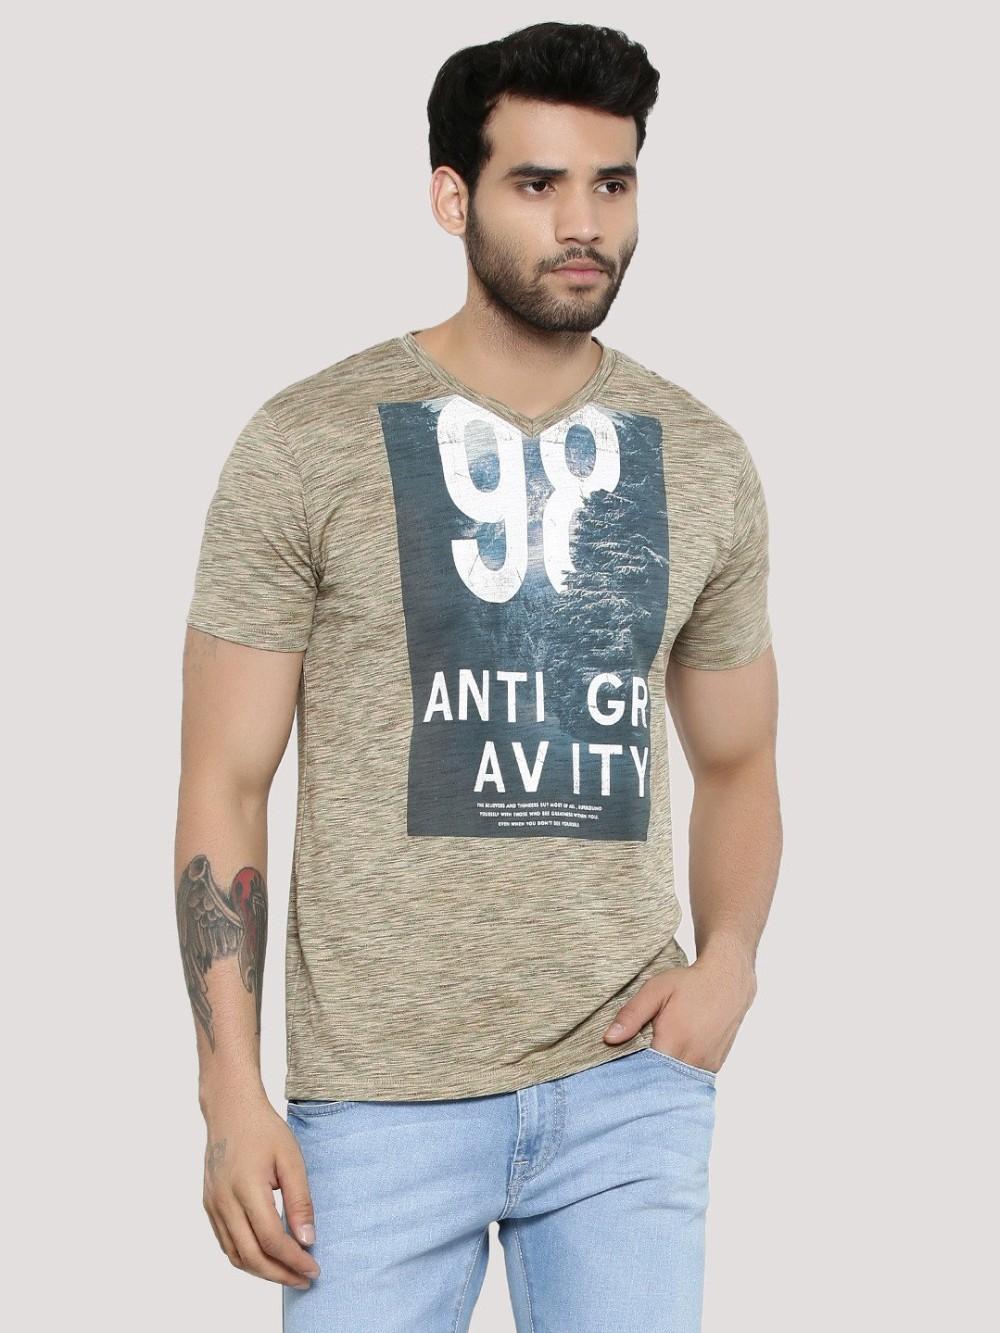 Deep Blank T Shirt Organic Cotton T Shirt Wholesale T